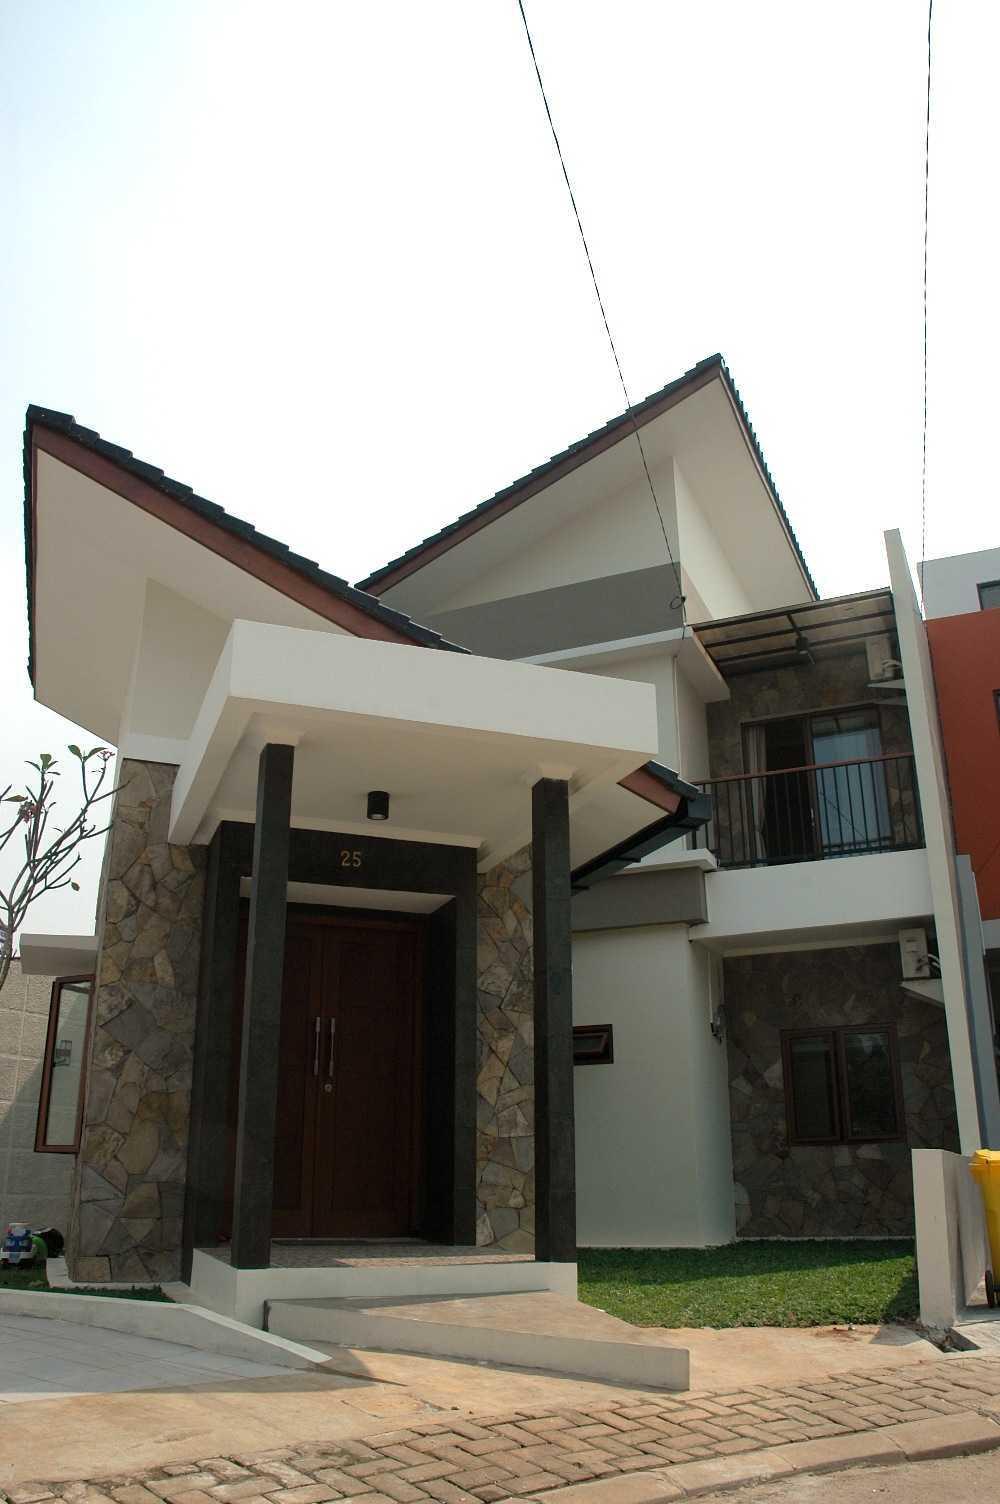 Triplus Homes Es House Rempoa, Ciputat Tim., Kota Tangerang Selatan, Banten, Indonesia Rempoa, Ciputat Tim., Kota Tangerang Selatan, Banten, Indonesia Triplus-Homes-Es-House  56611